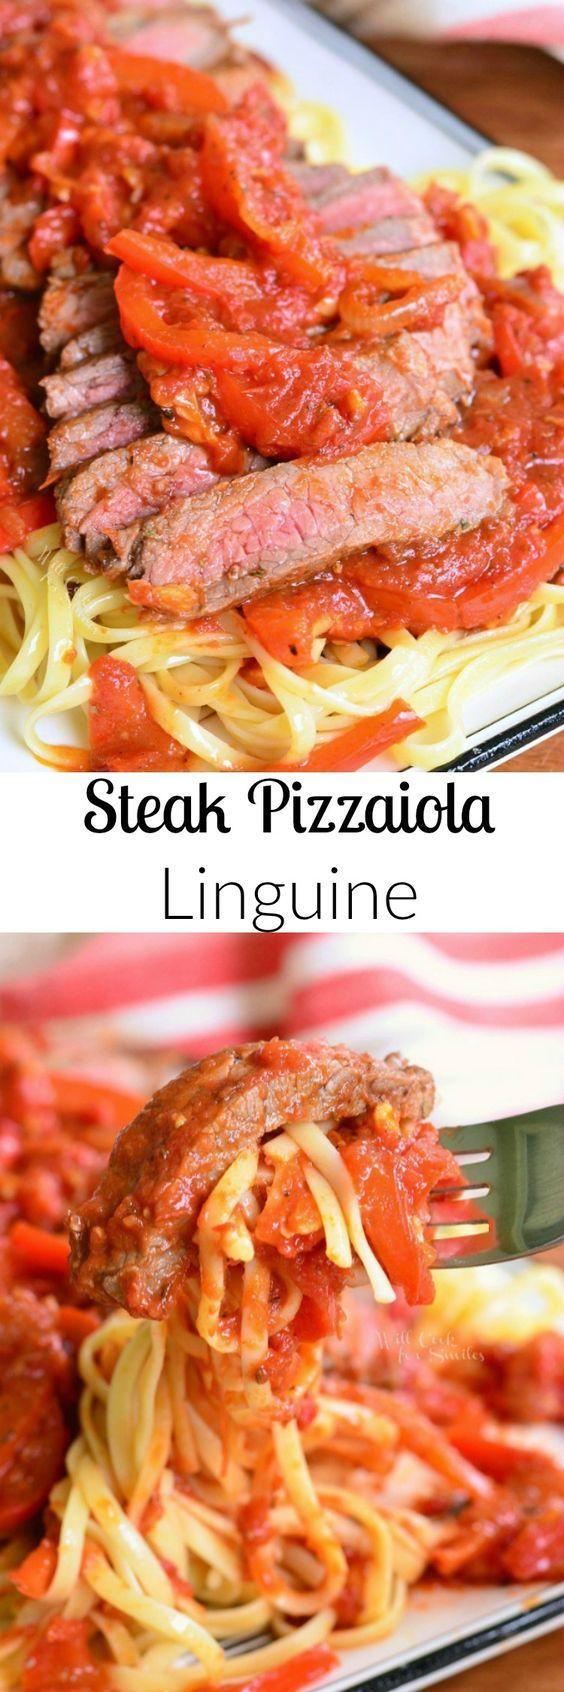 Steak Pizzaiola Linguine. Delicious Italian dish made with seared tender sirloin…